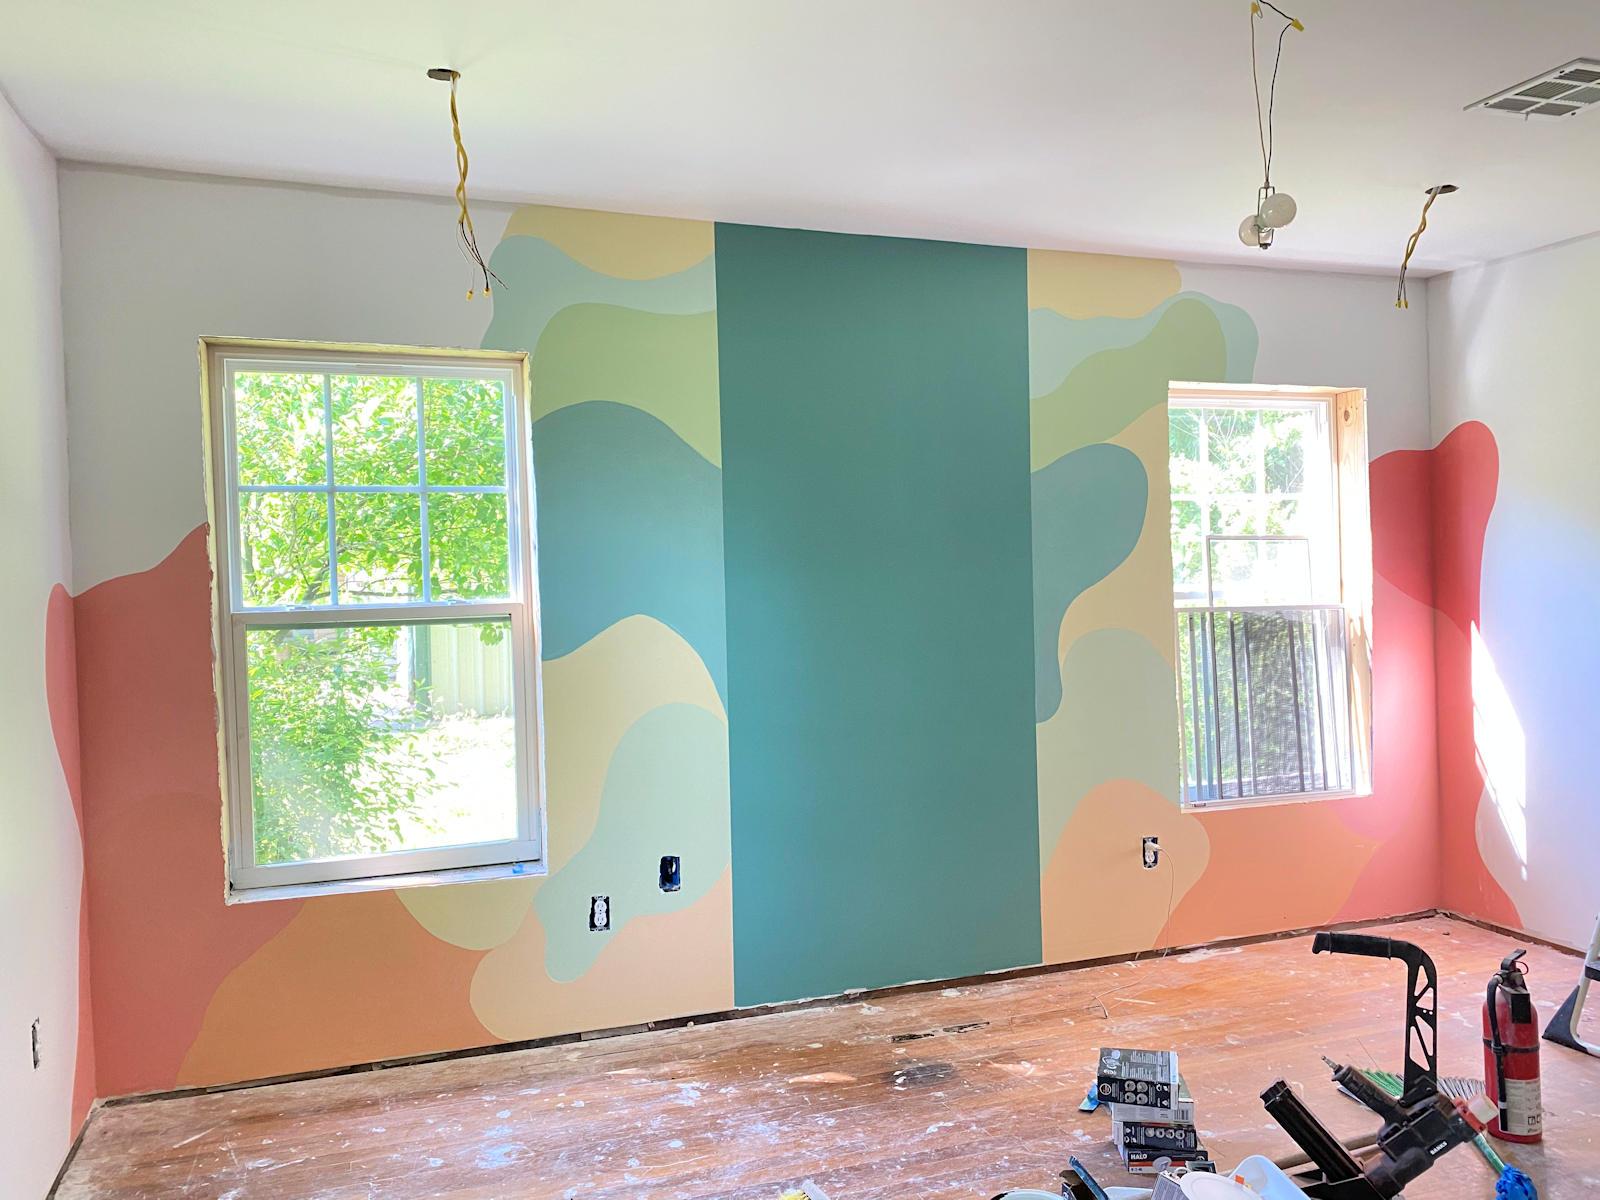 home gym walls with freeform design 8